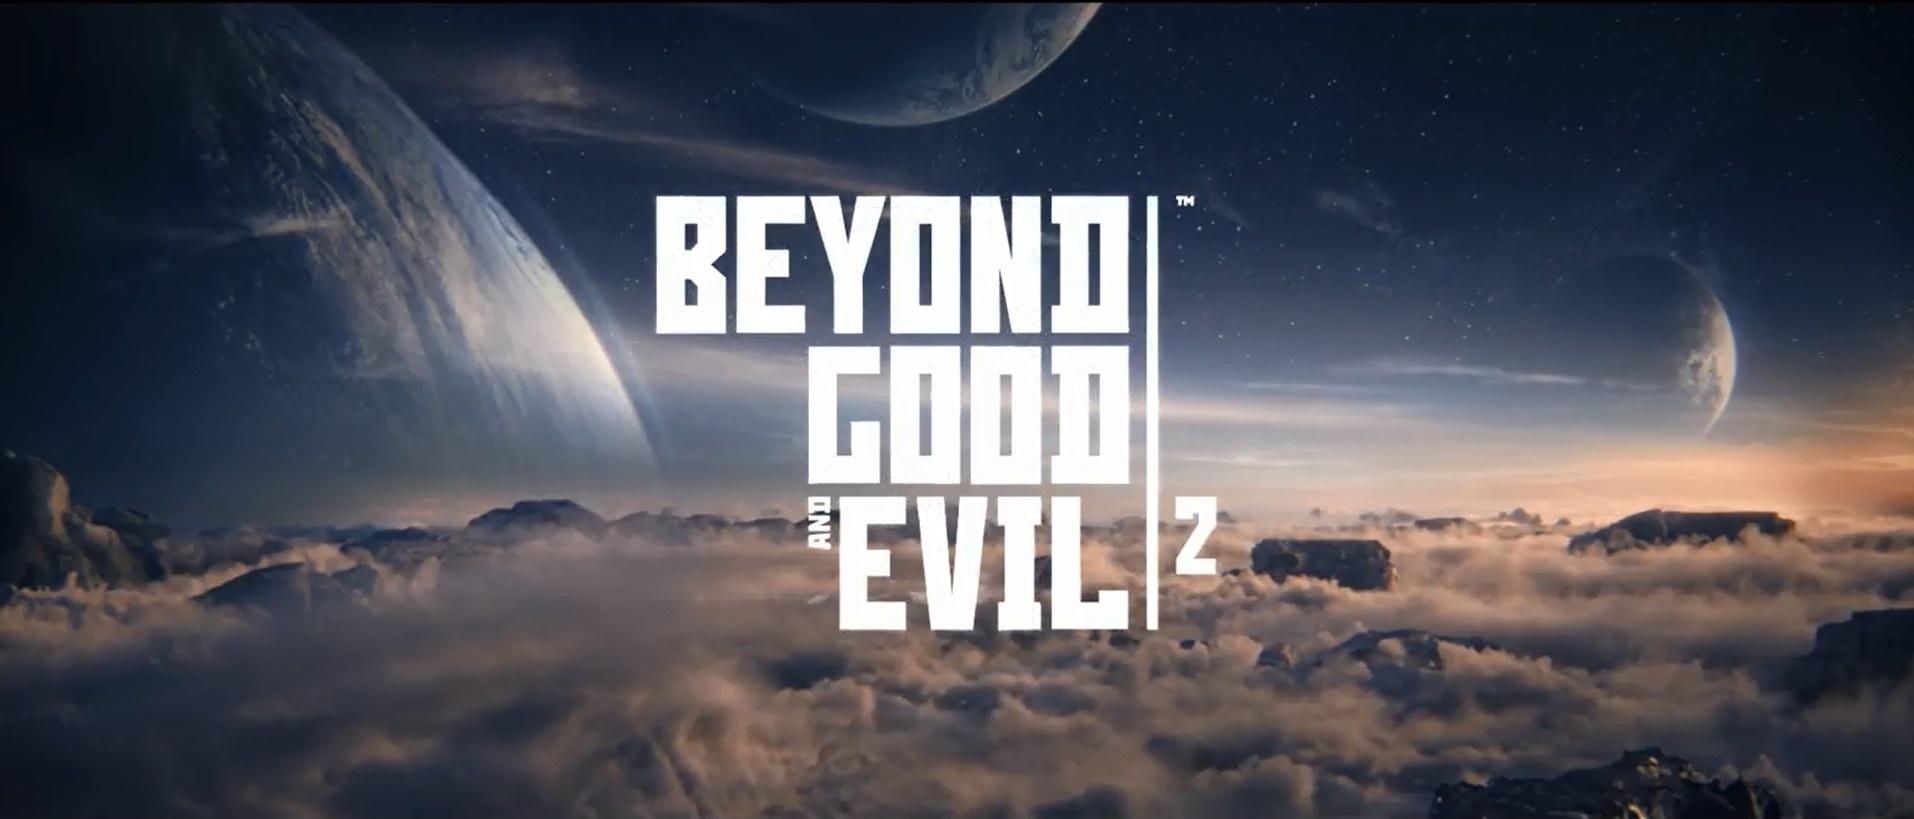 beyond-good-and-evil-y6r28.jpg